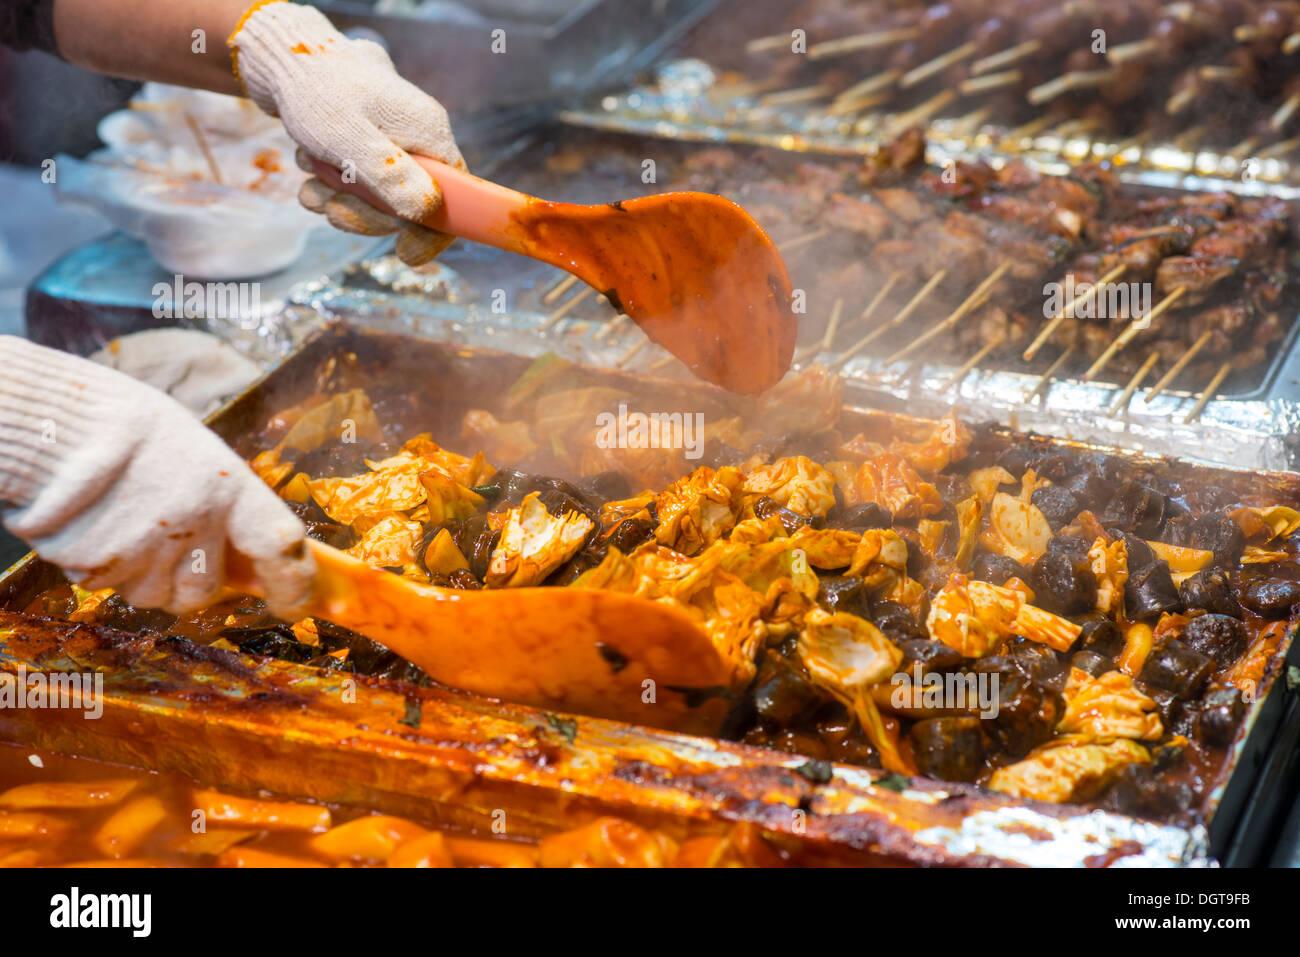 Food preperation at a night market in Myeong-dong, Seoul, South Korea. - Stock Image